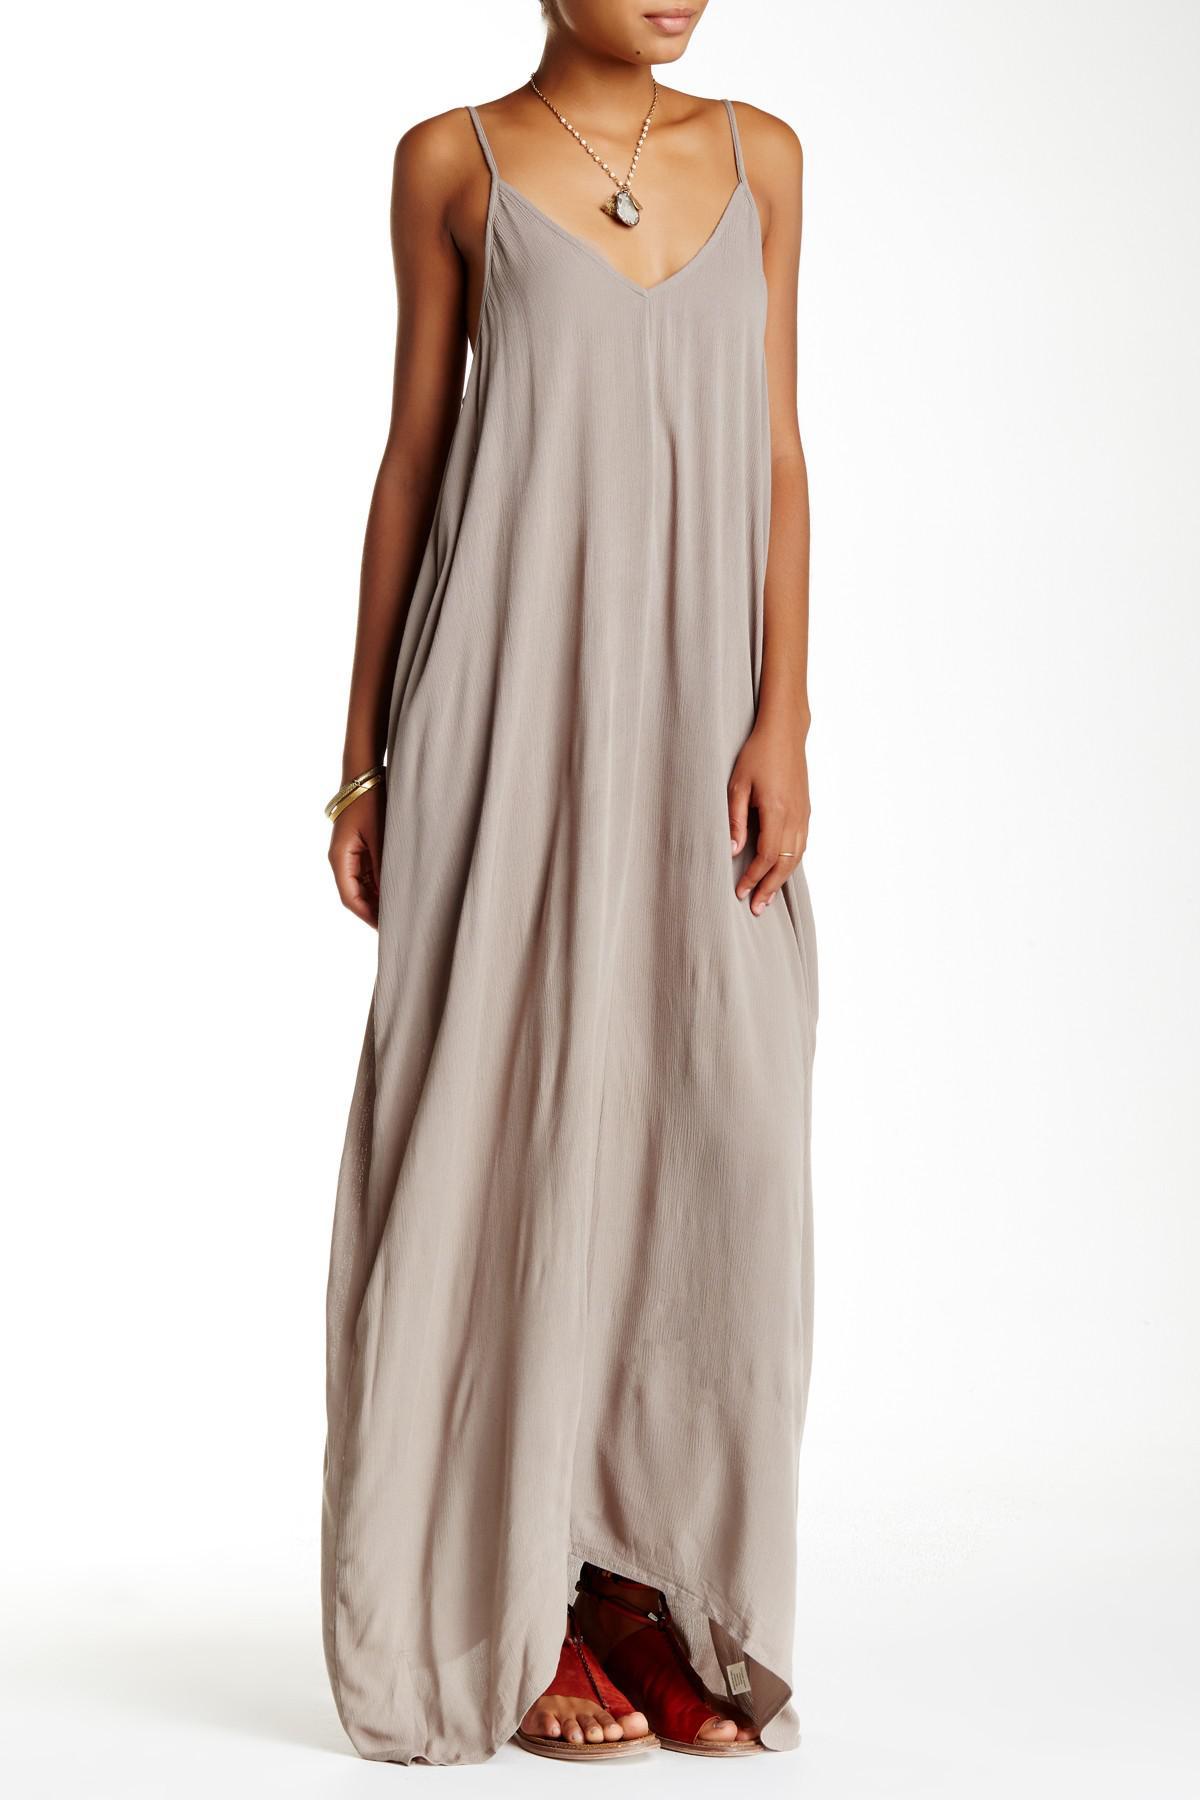 Lyst - Love Stitch Gauze Maxi Dress